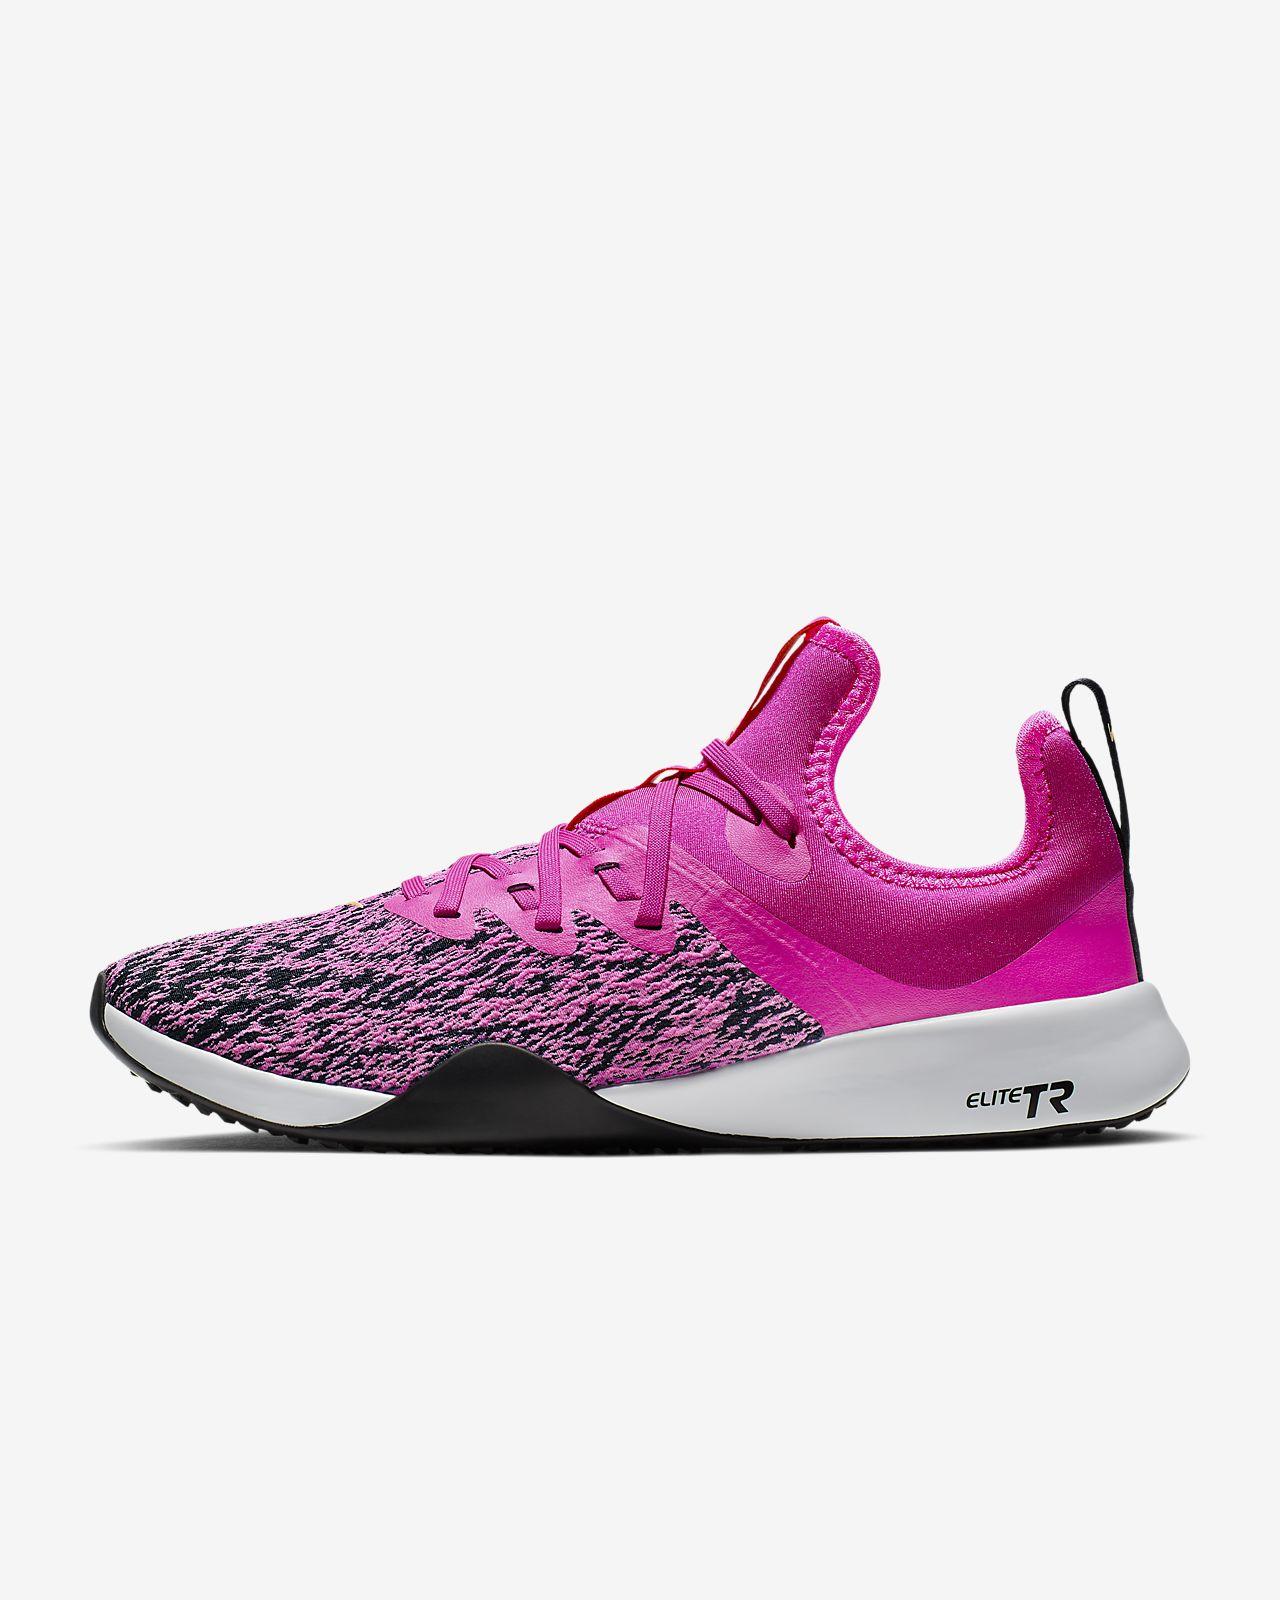 2c3e2421a Nike Foundation Elite TR Women's Training Shoe. Nike.com ID